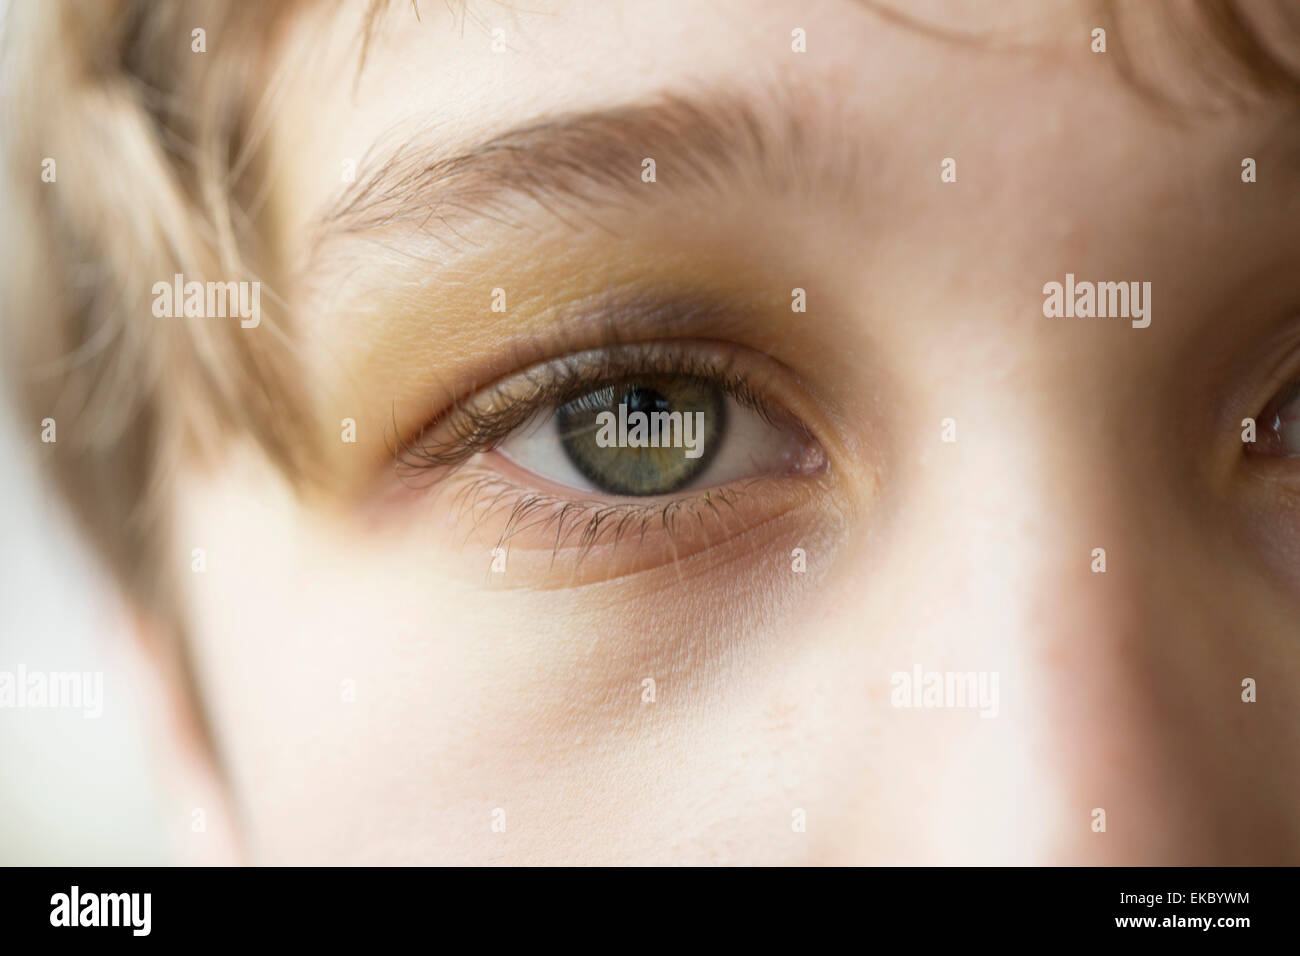 Close up of boy's eye Photo Stock